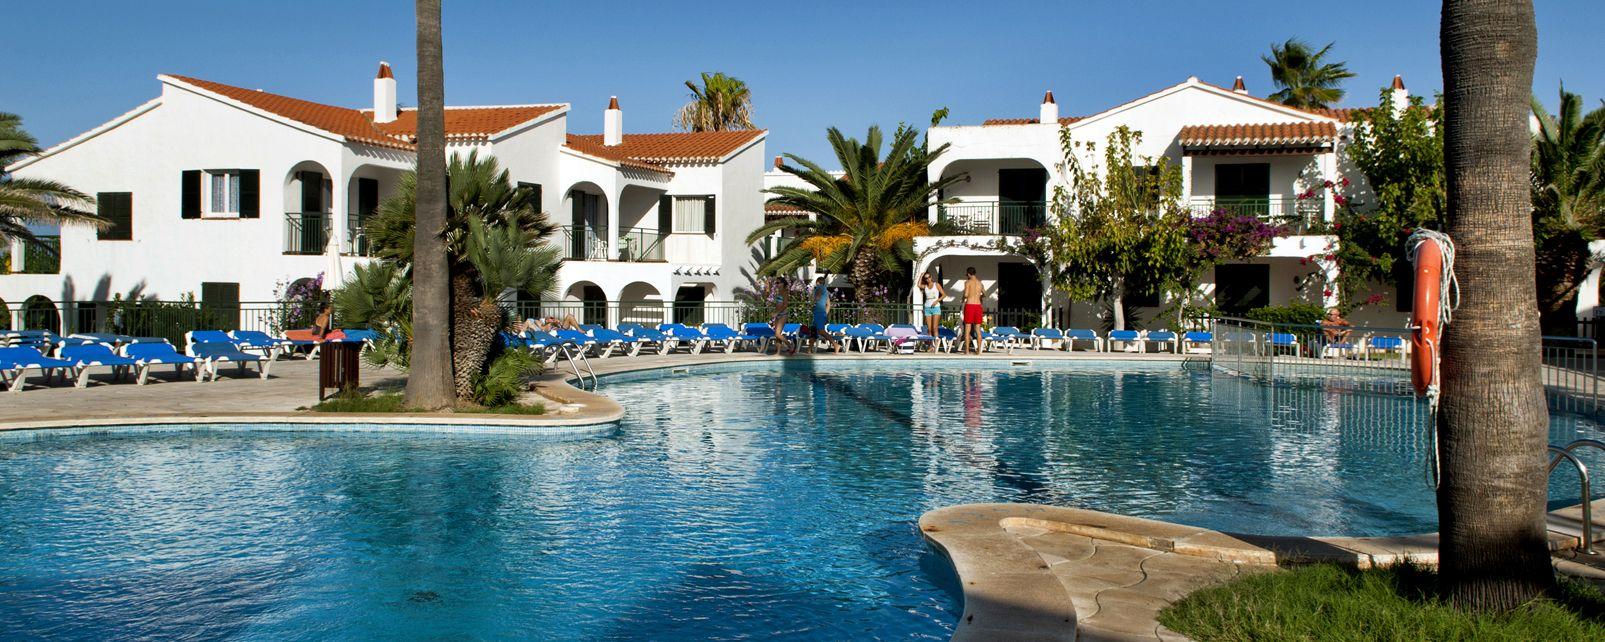 h tel club marmara oasis menorca ciutadella espagne